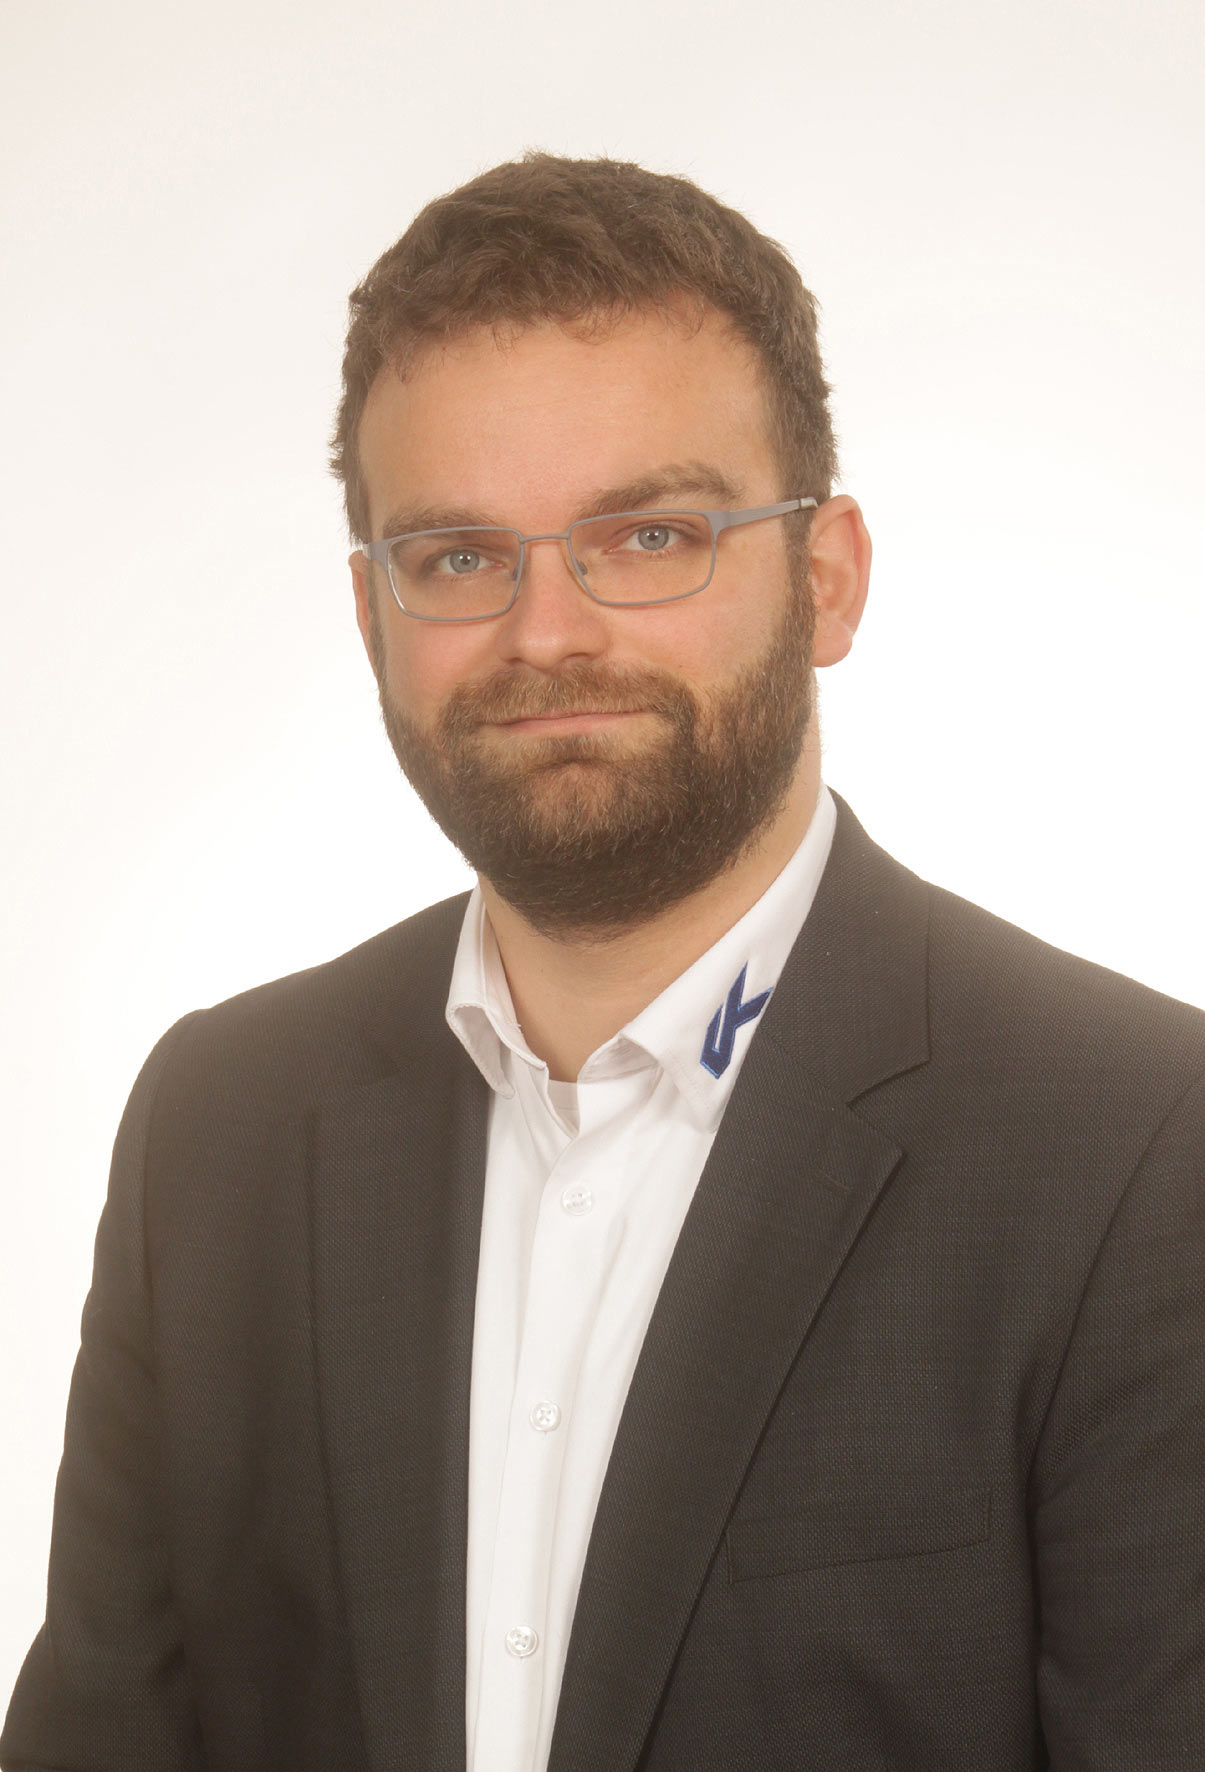 Daniel Höhne